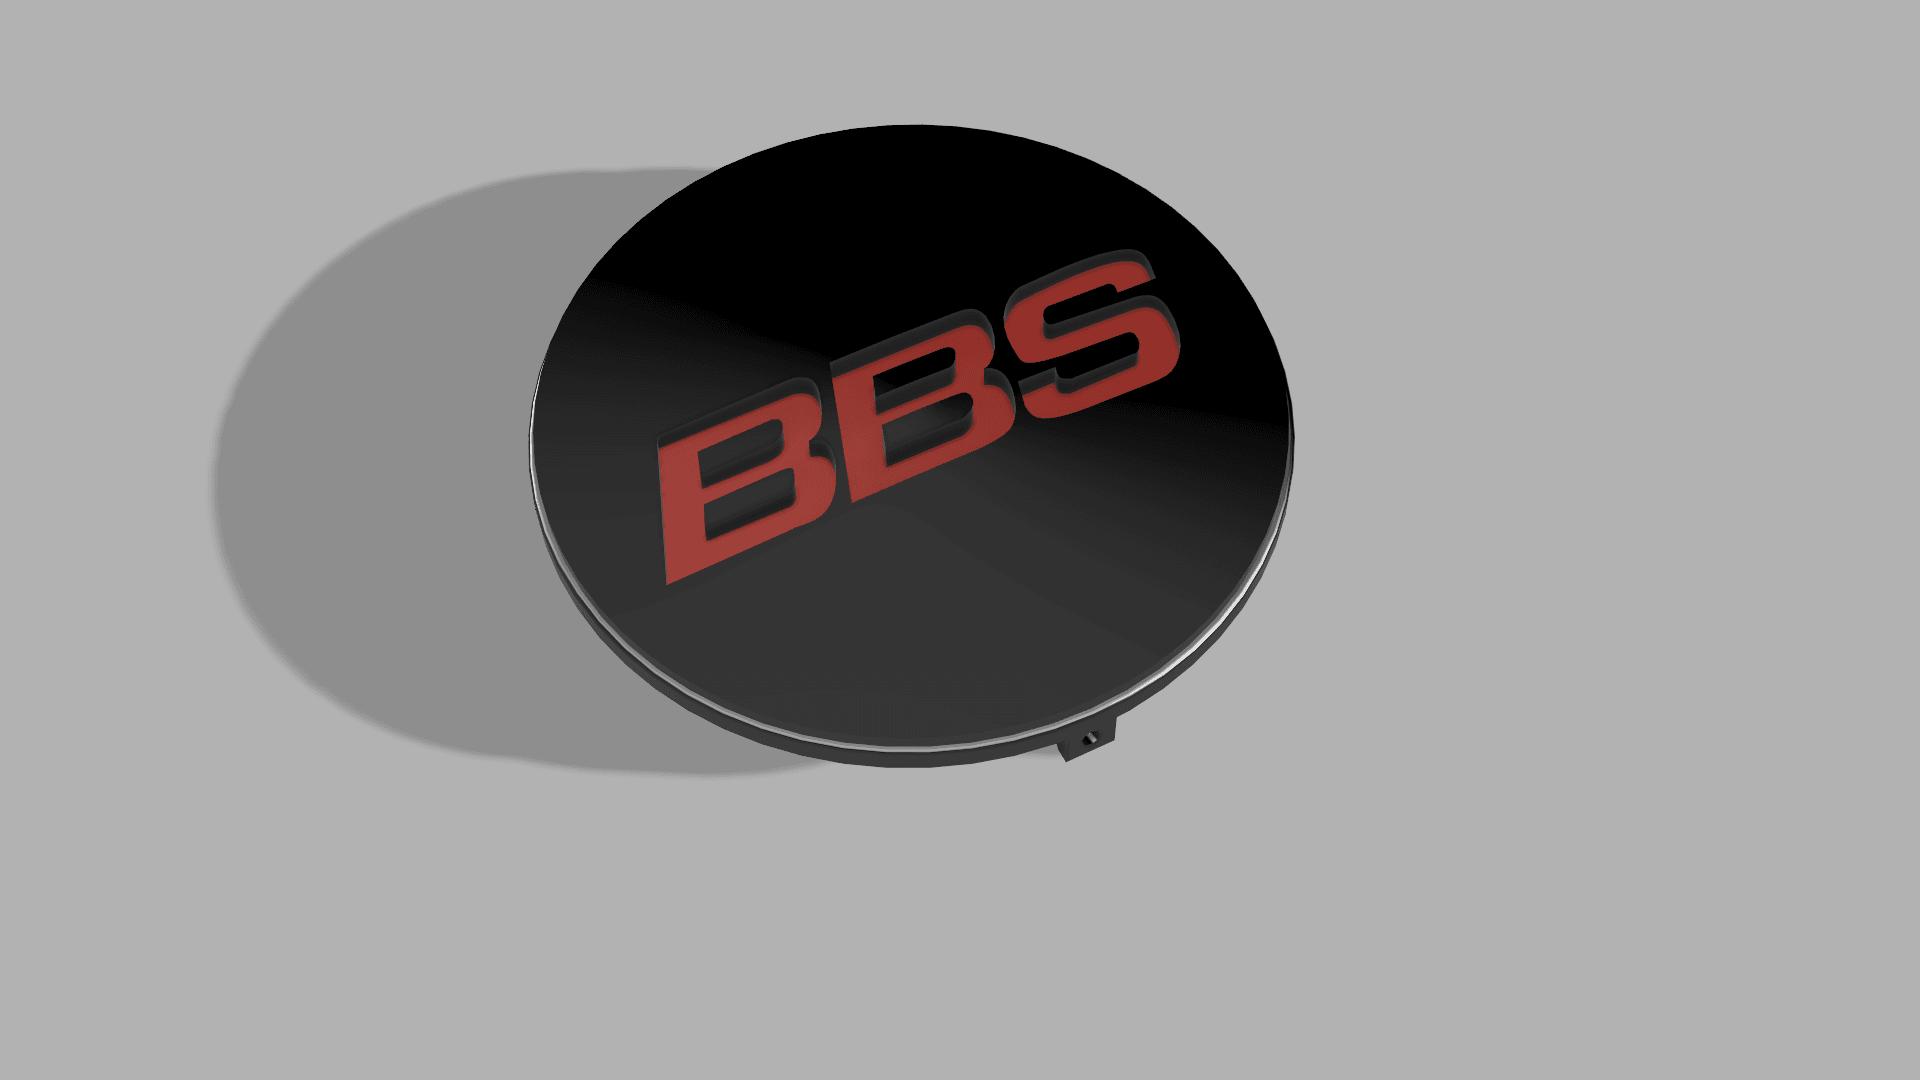 LIGHT_COVER 2 picture 2.png Download STL file Golf mk2 BBS Light Cover • 3D printer object, Marcin_Wojcik